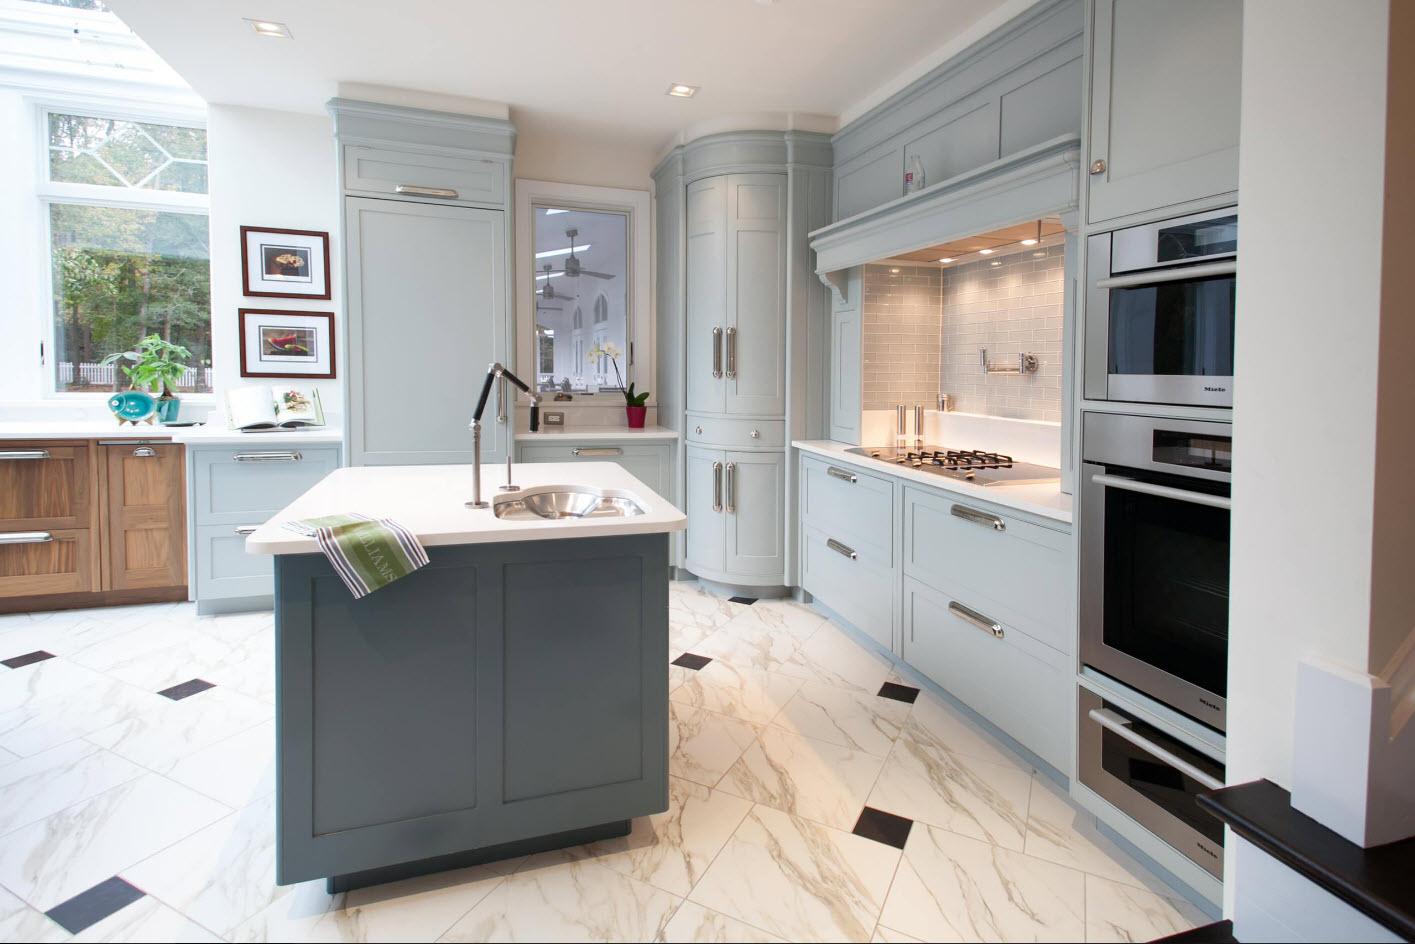 Ultramodern kitchen design with classic kitchen set though